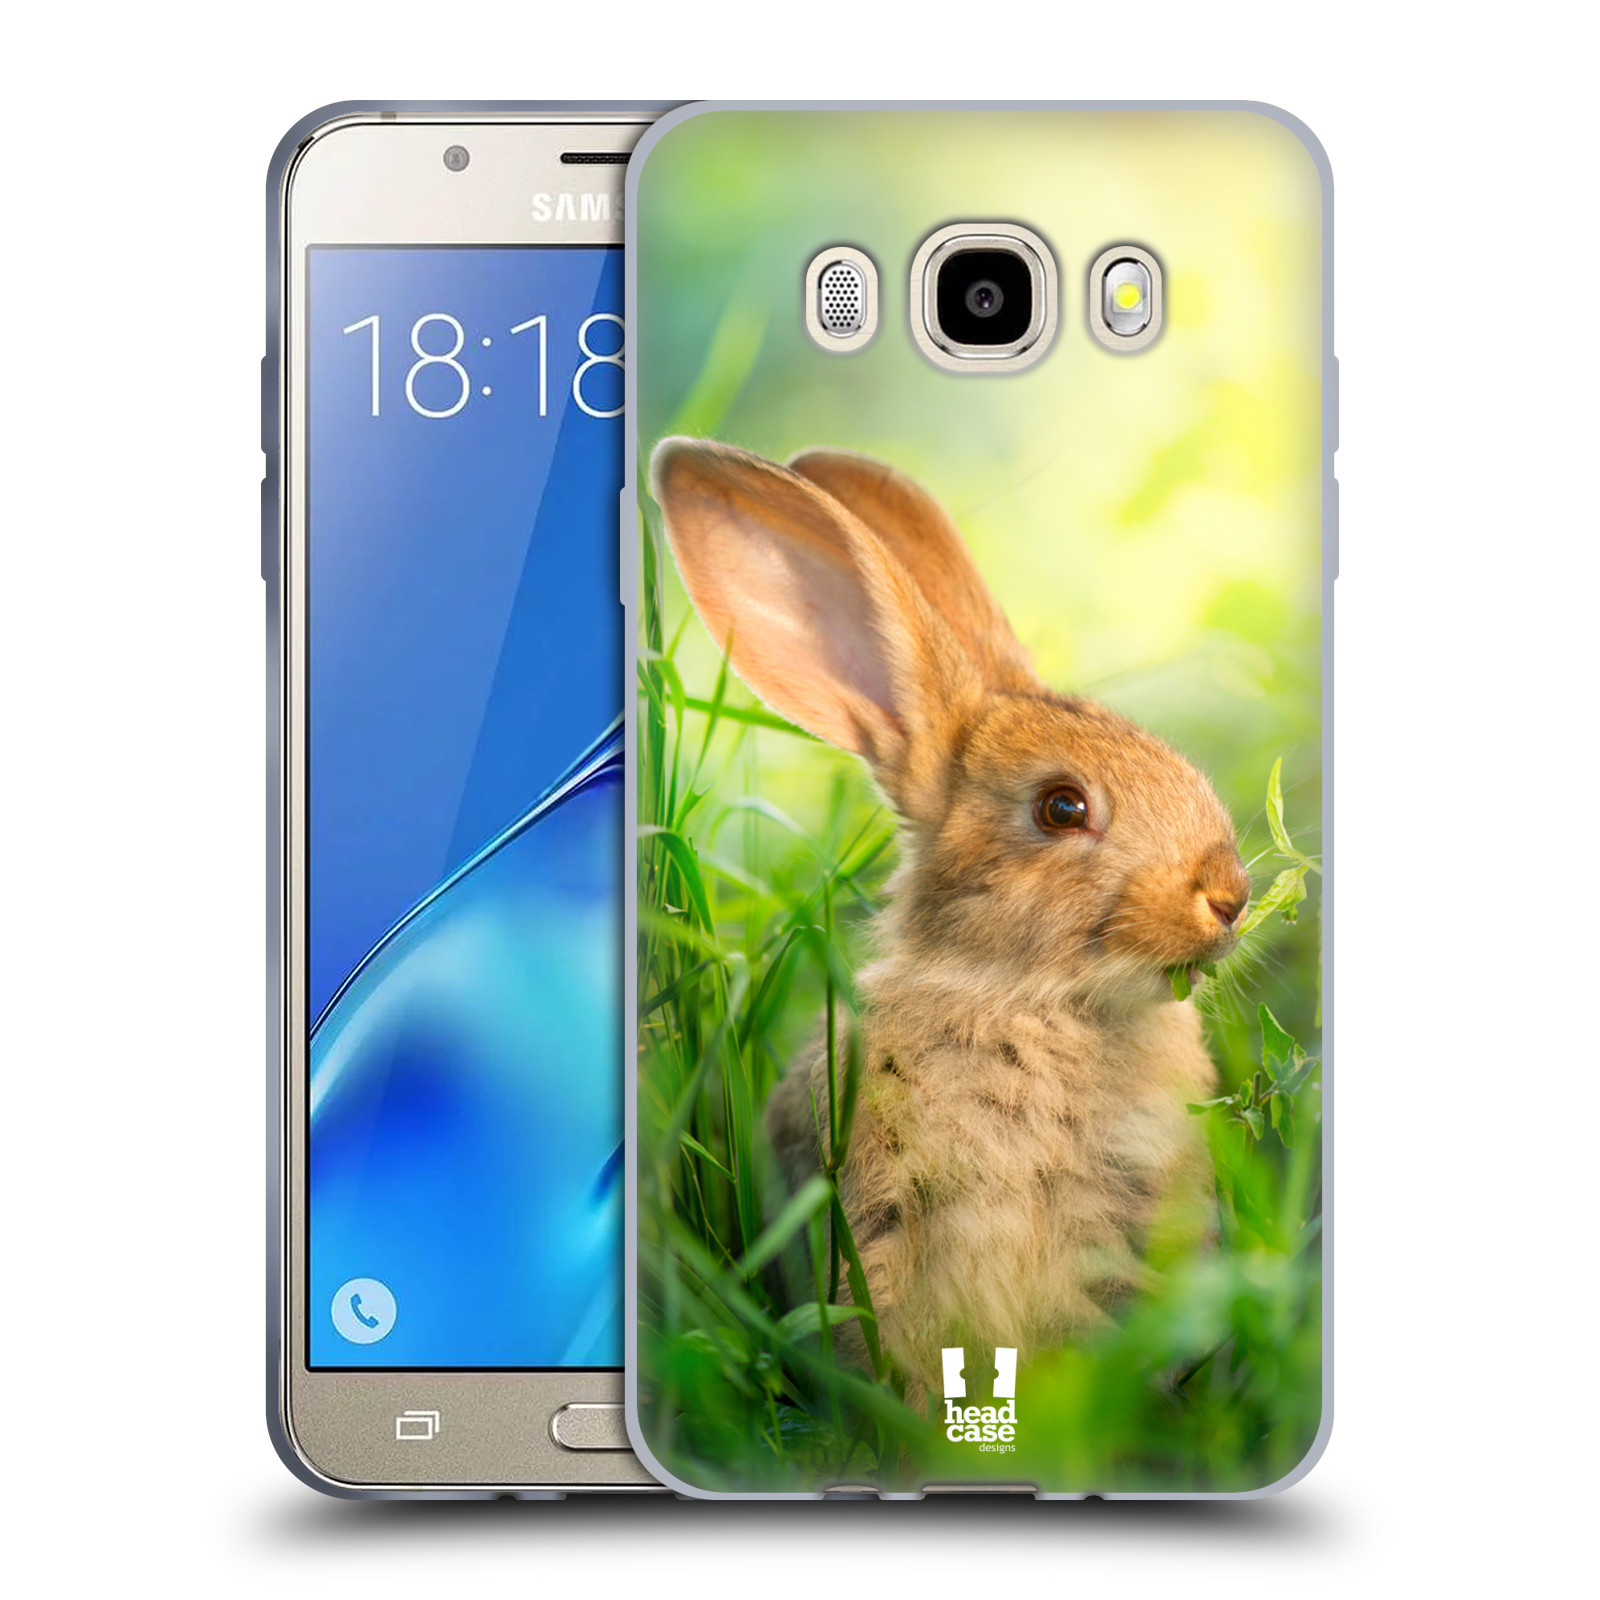 HEAD CASE silikonový obal, kryt na mobil Samsung Galaxy J5 2016, J510, J510F, (J510F DUAL SIM) vzor Divočina, Divoký život a zvířata foto ZAJÍČEK V TRÁVĚ ZELENÁ